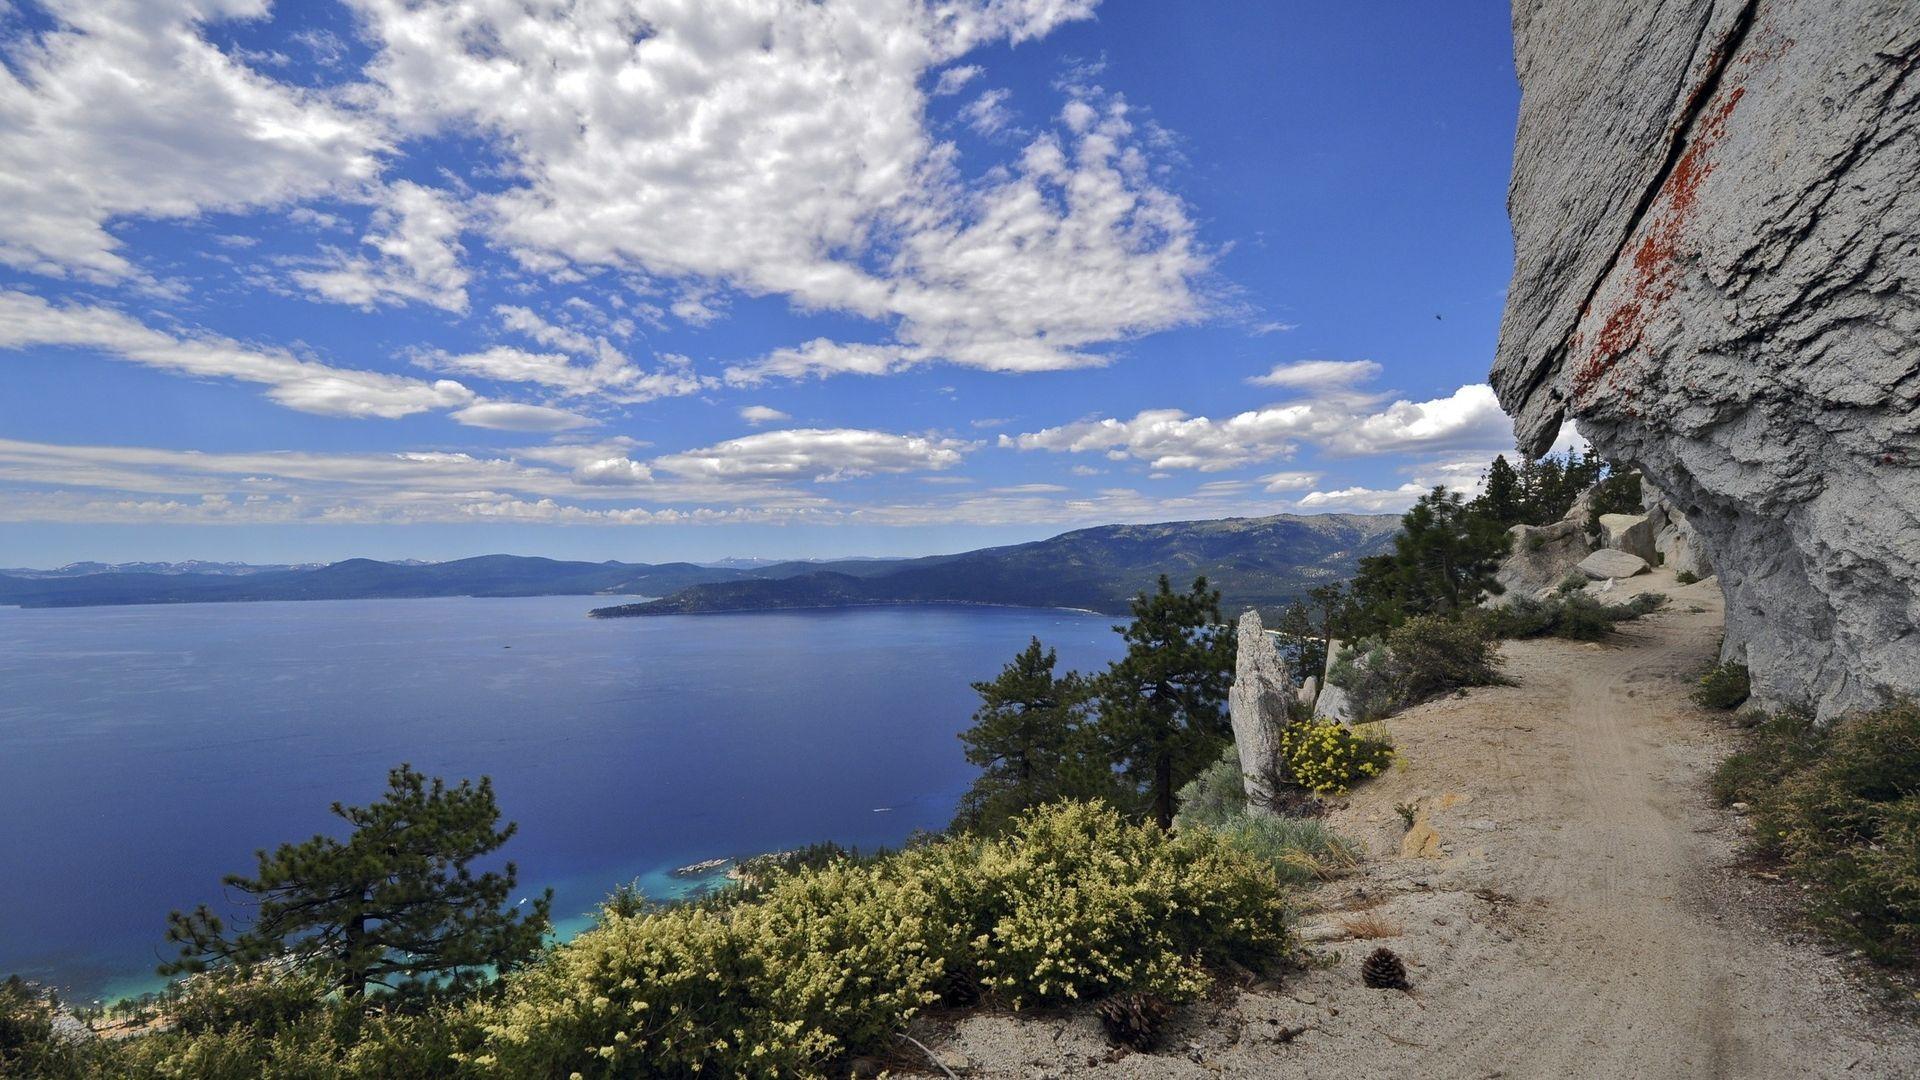 Lake Tahoe picture free download